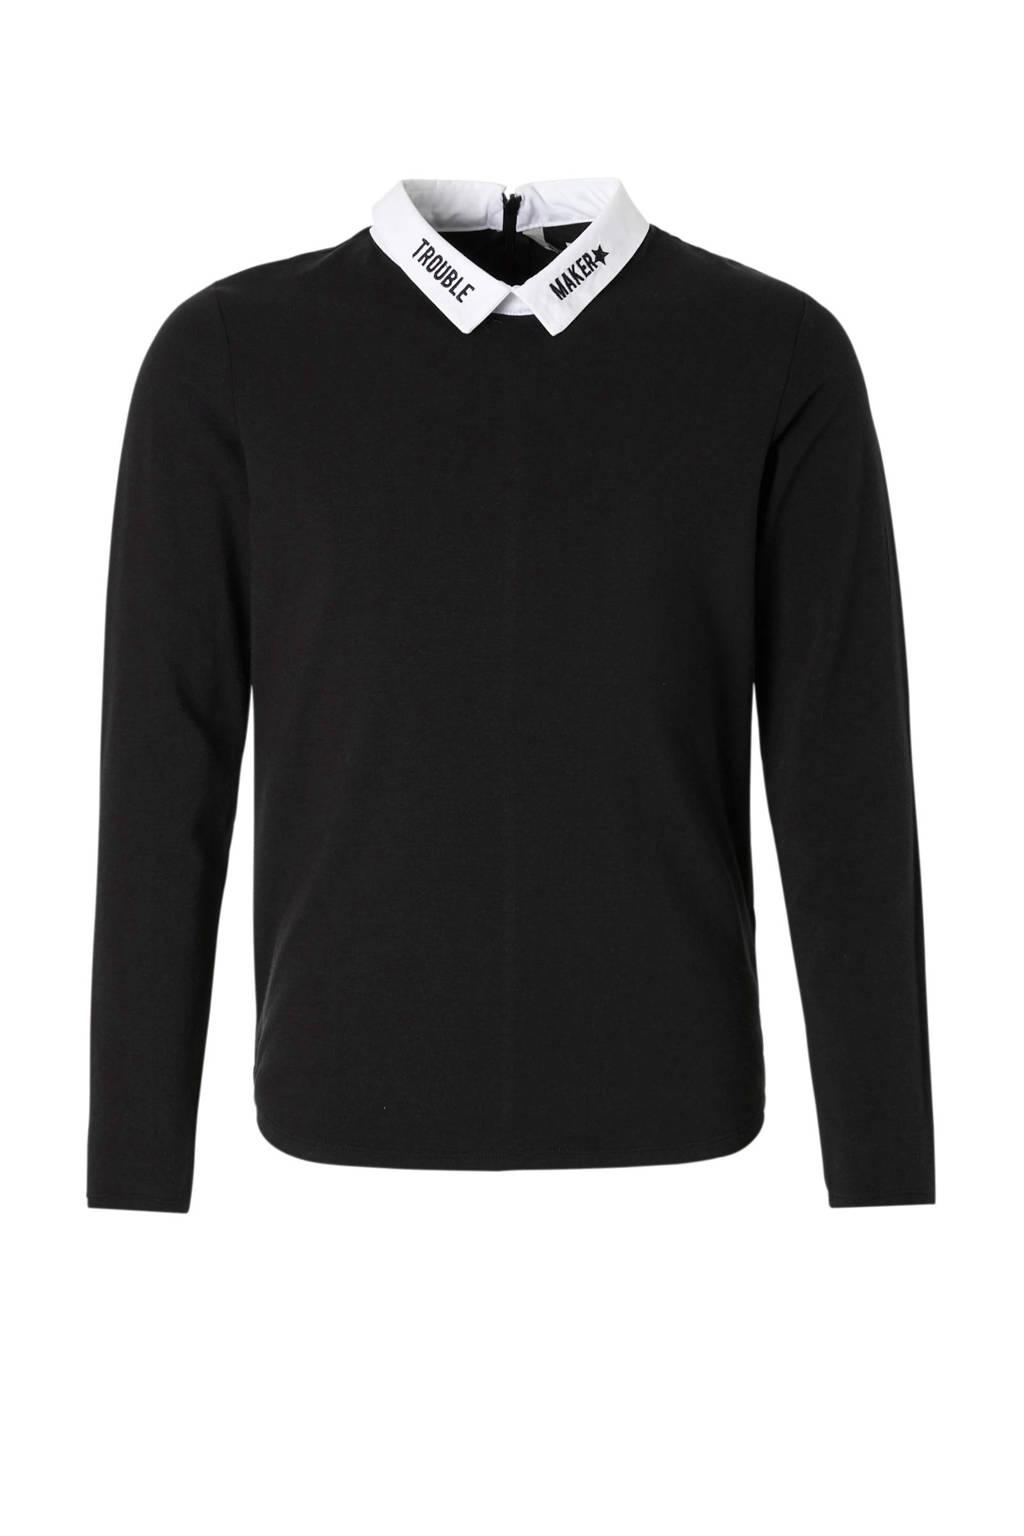 Garcia trui zwart, Zwart/wit